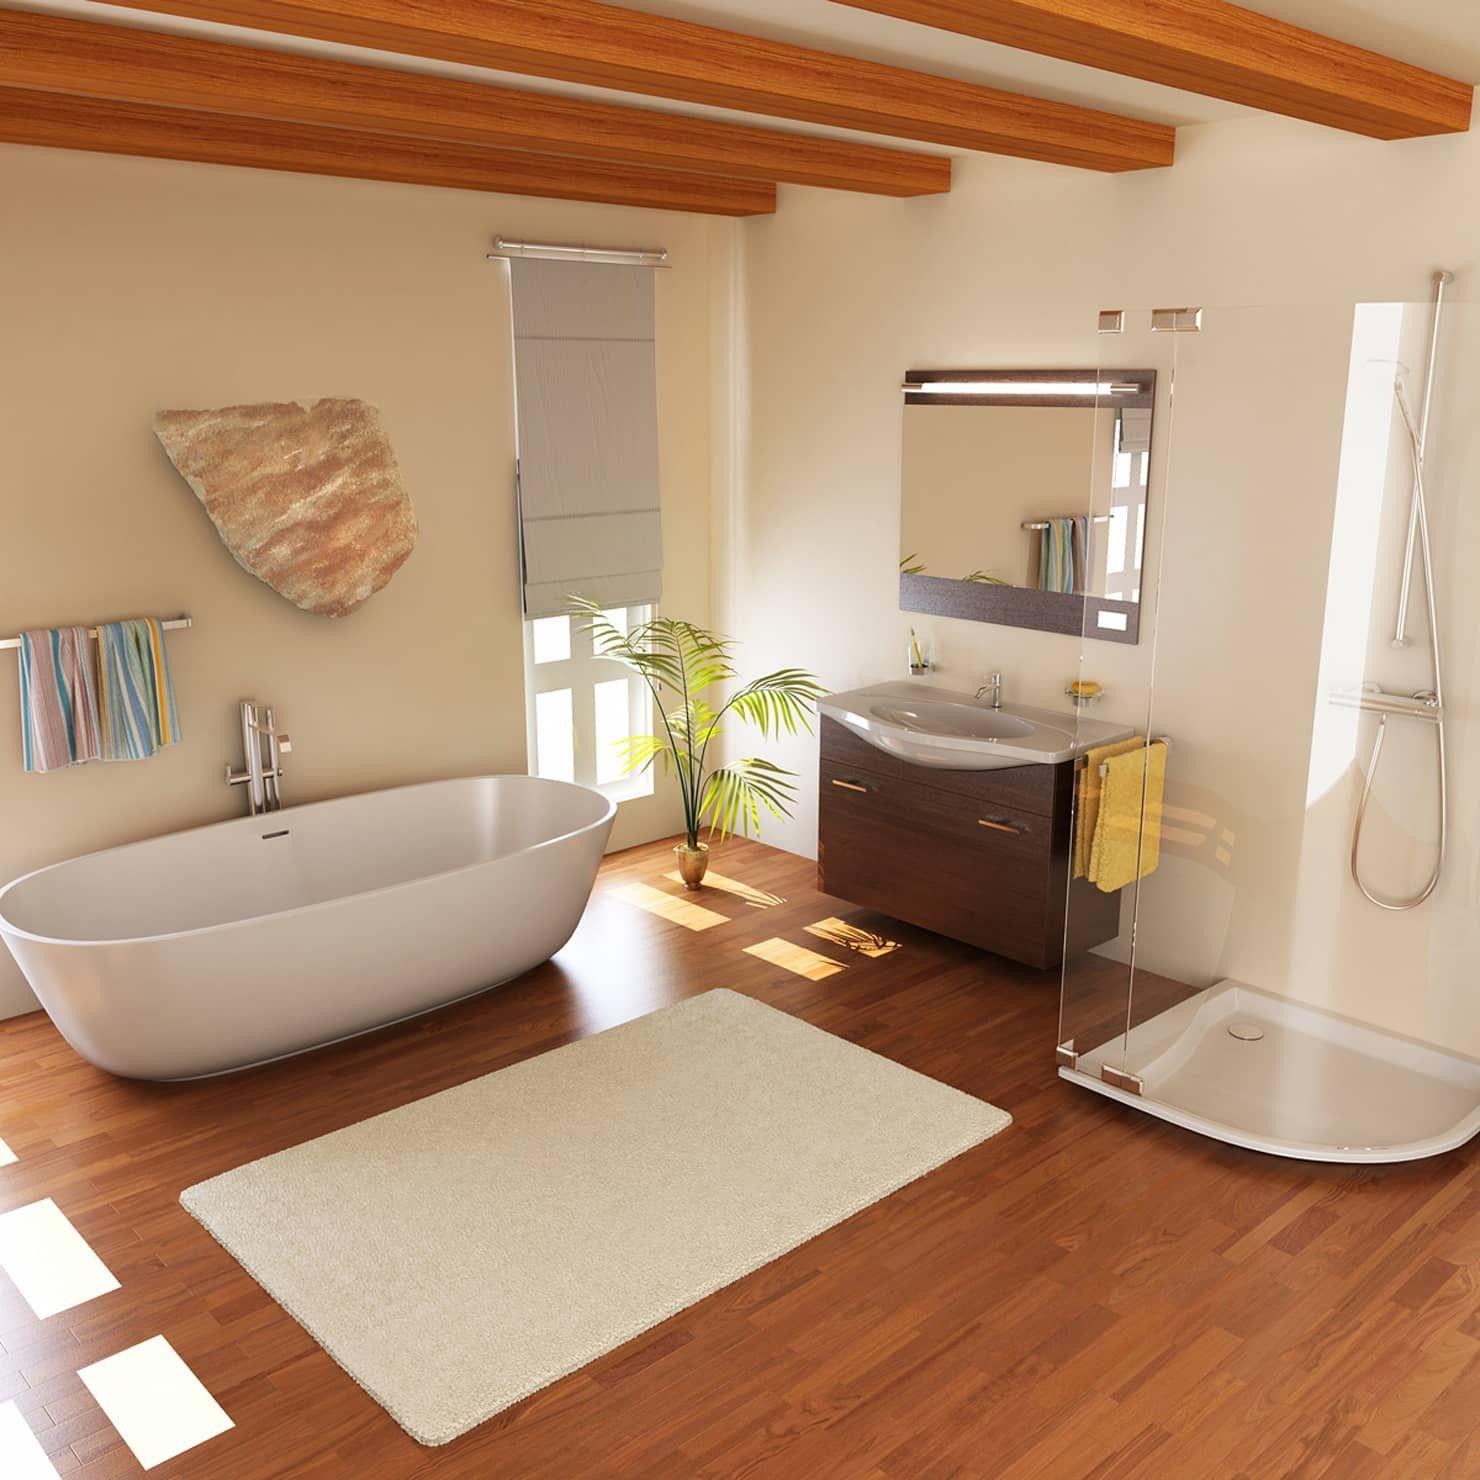 Modern Bathroom By Ali Cura Modern Bathroom Design Small Laminate Flooring Bathroom Wood Look Tile